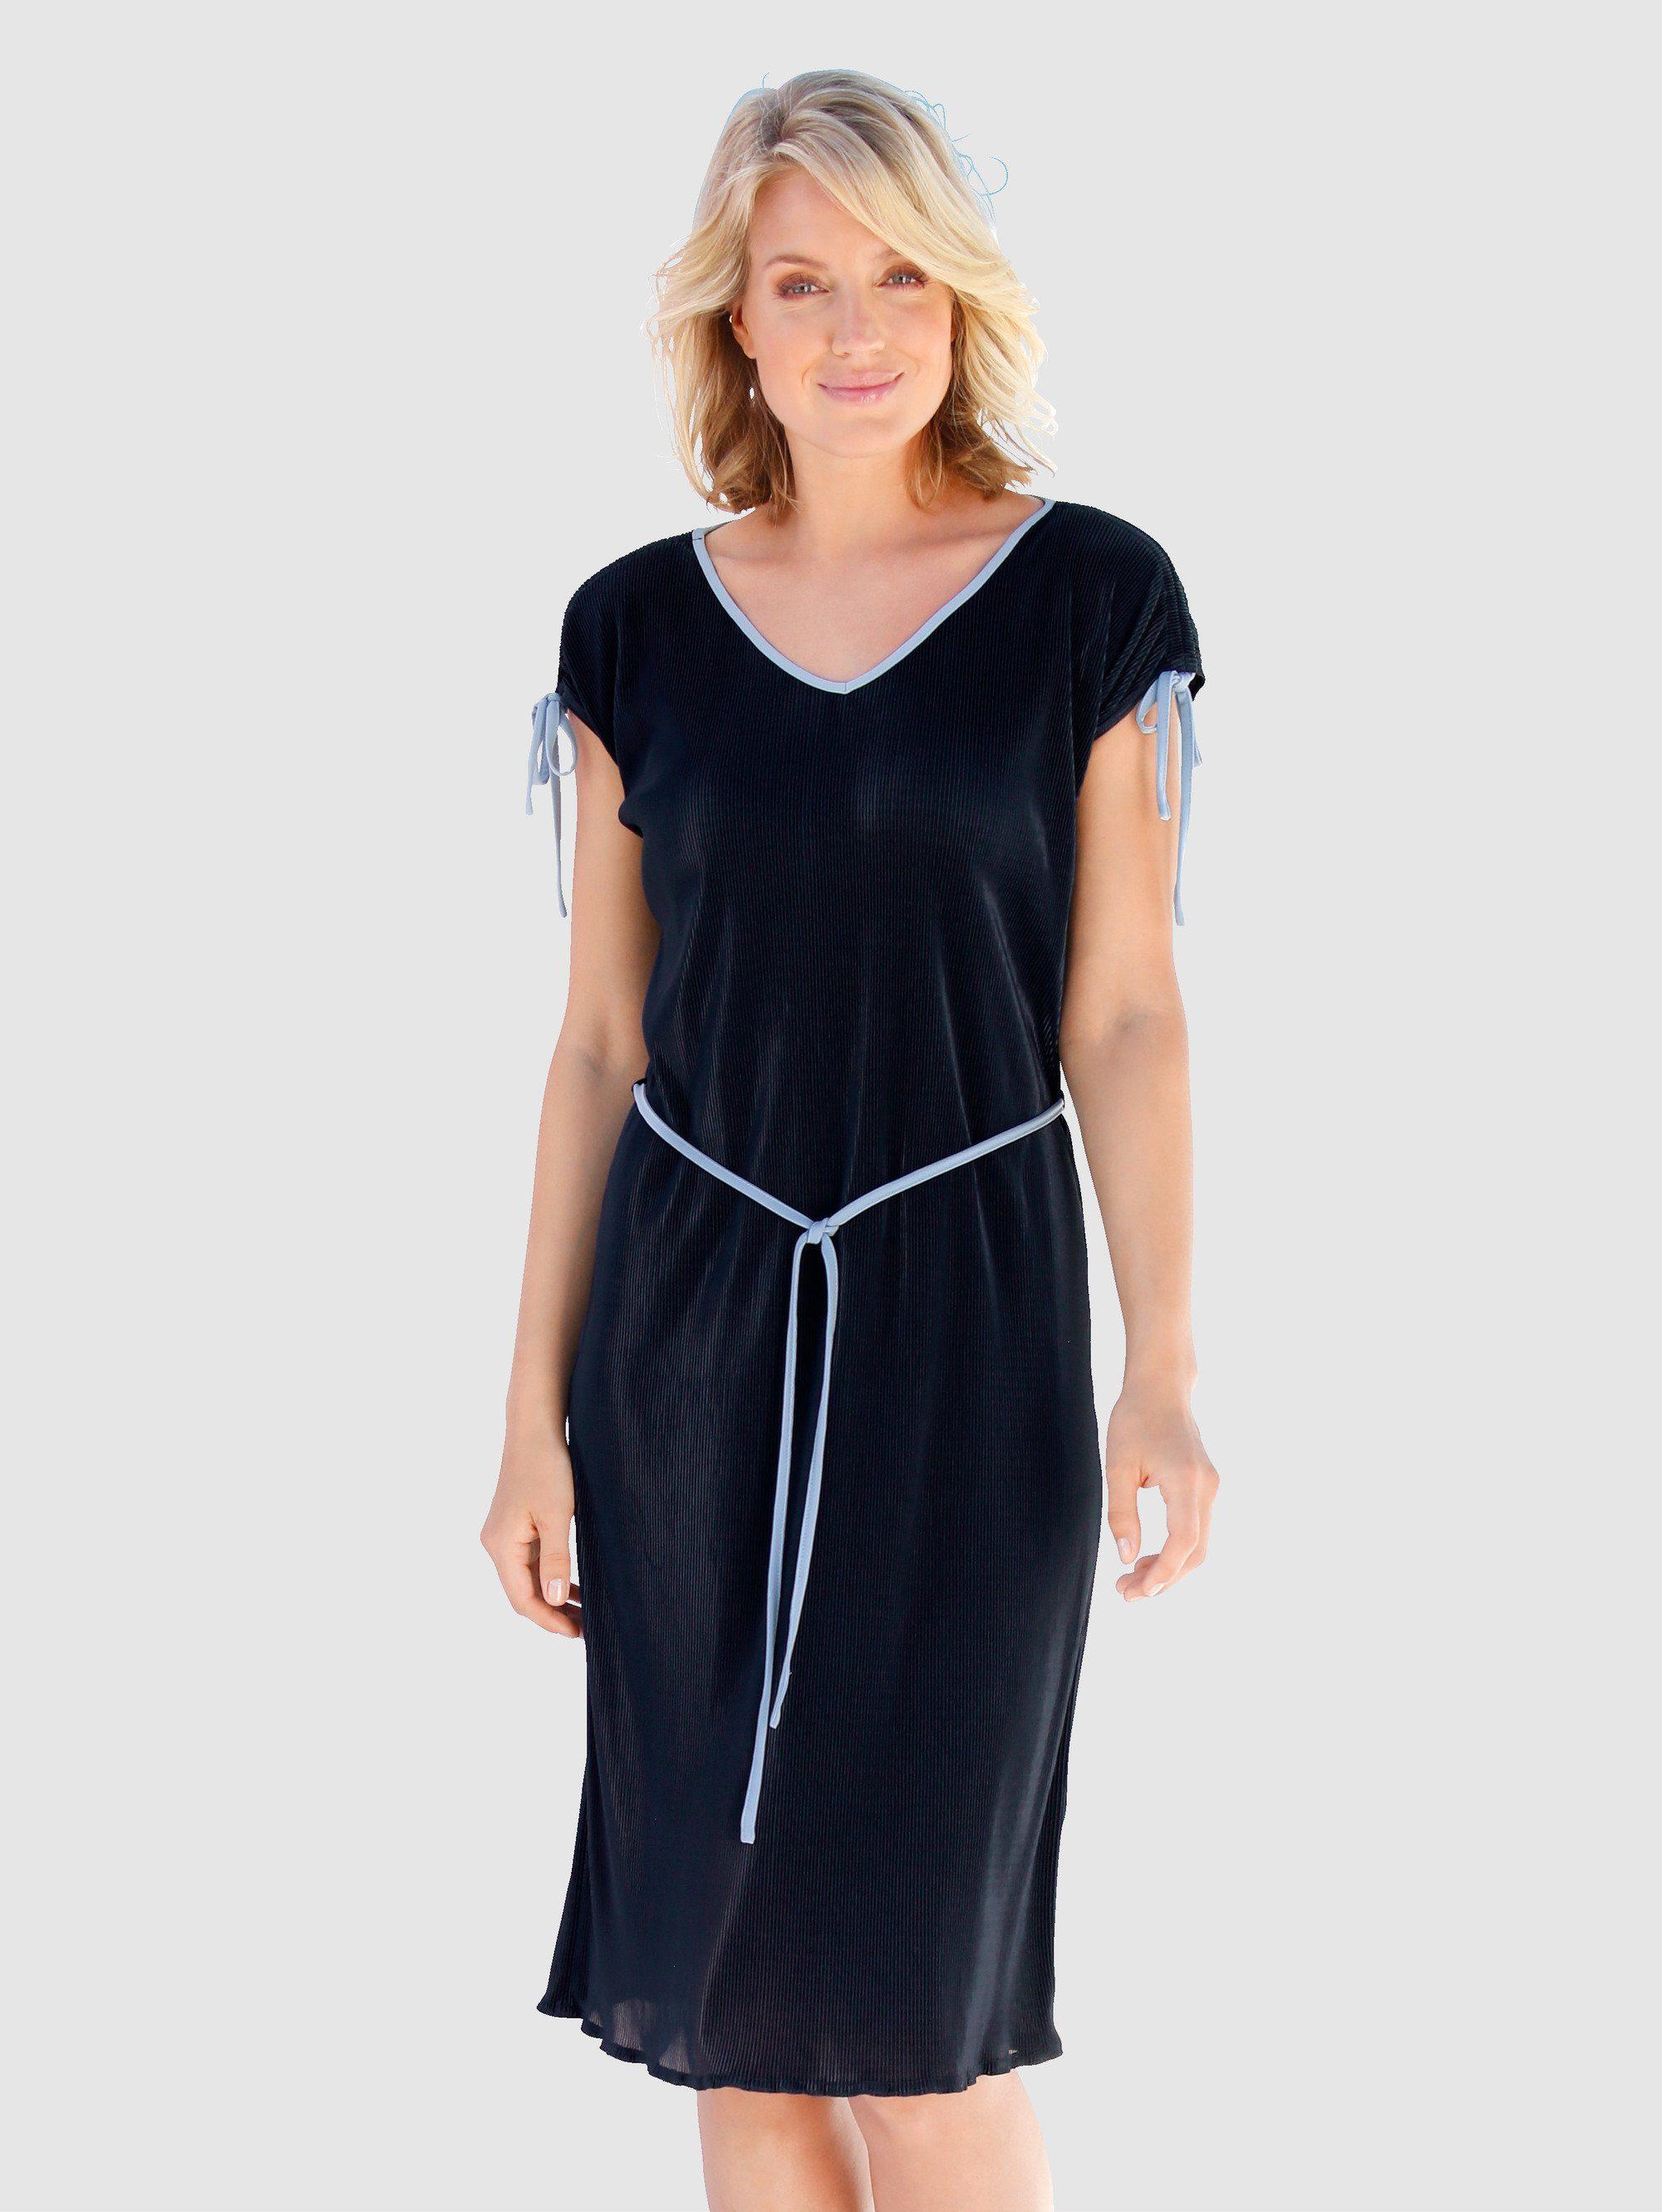 By Alina Damenkleid Jeanshemd Minikleid Jeanskleid Jeans Kleid Bluse Spitze XS-M